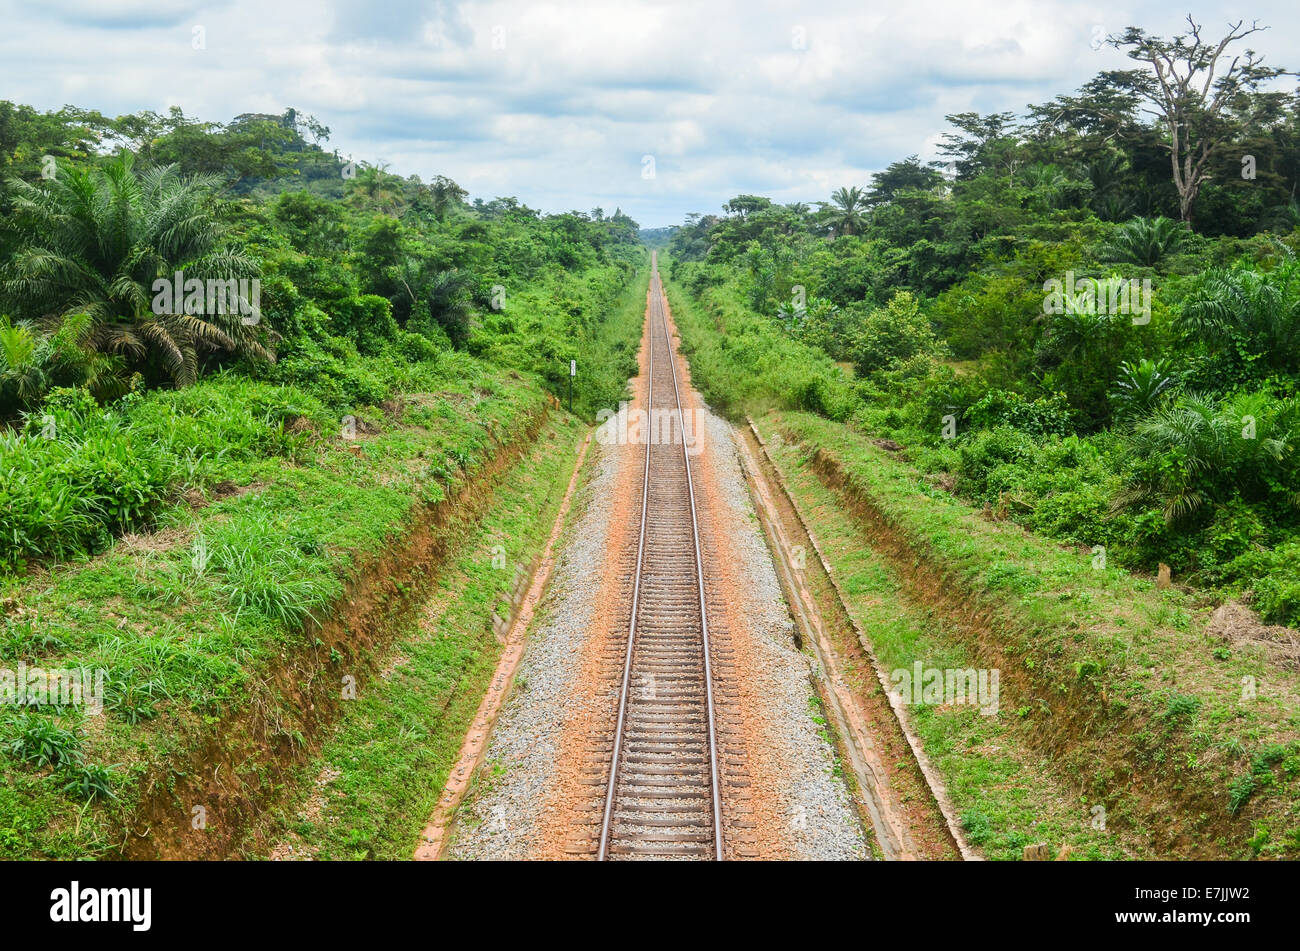 The railway enabling ArcelorMittal's iron mining in Nimba County, northern Liberia - Stock Image